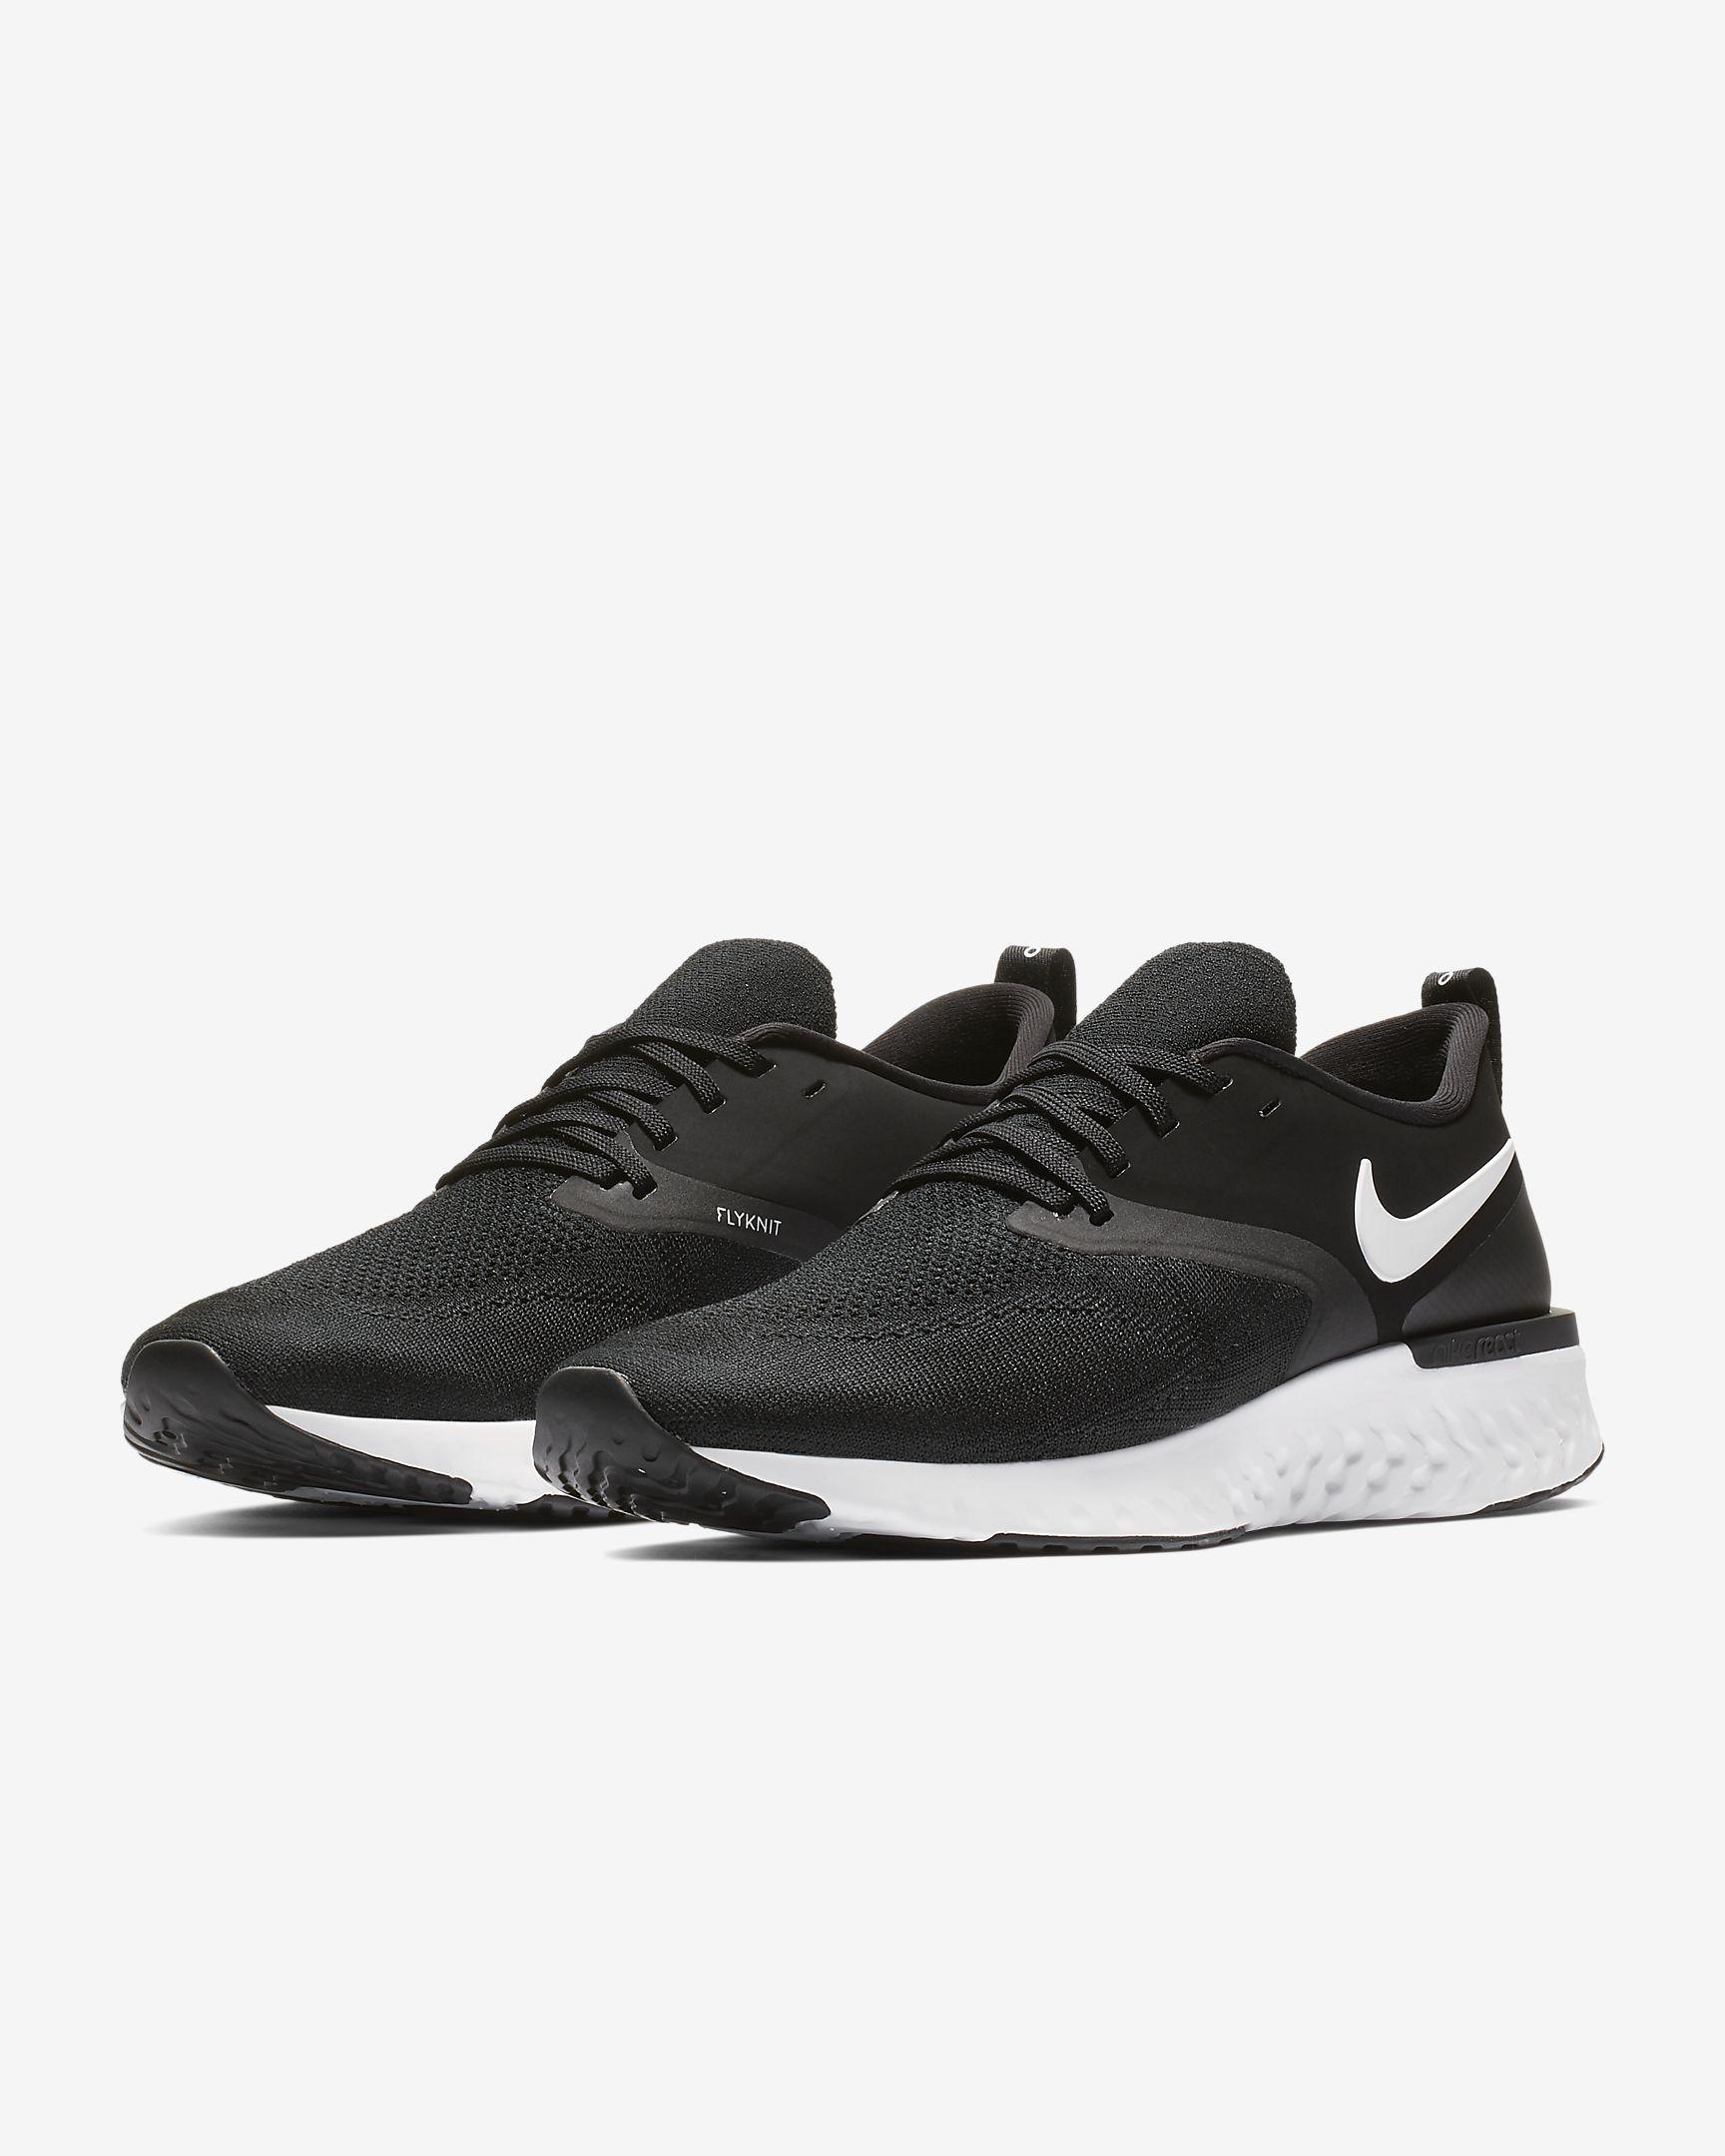 79df0bf8135fae Nike Odyssey React Flyknit 2 Men s Running Shoe